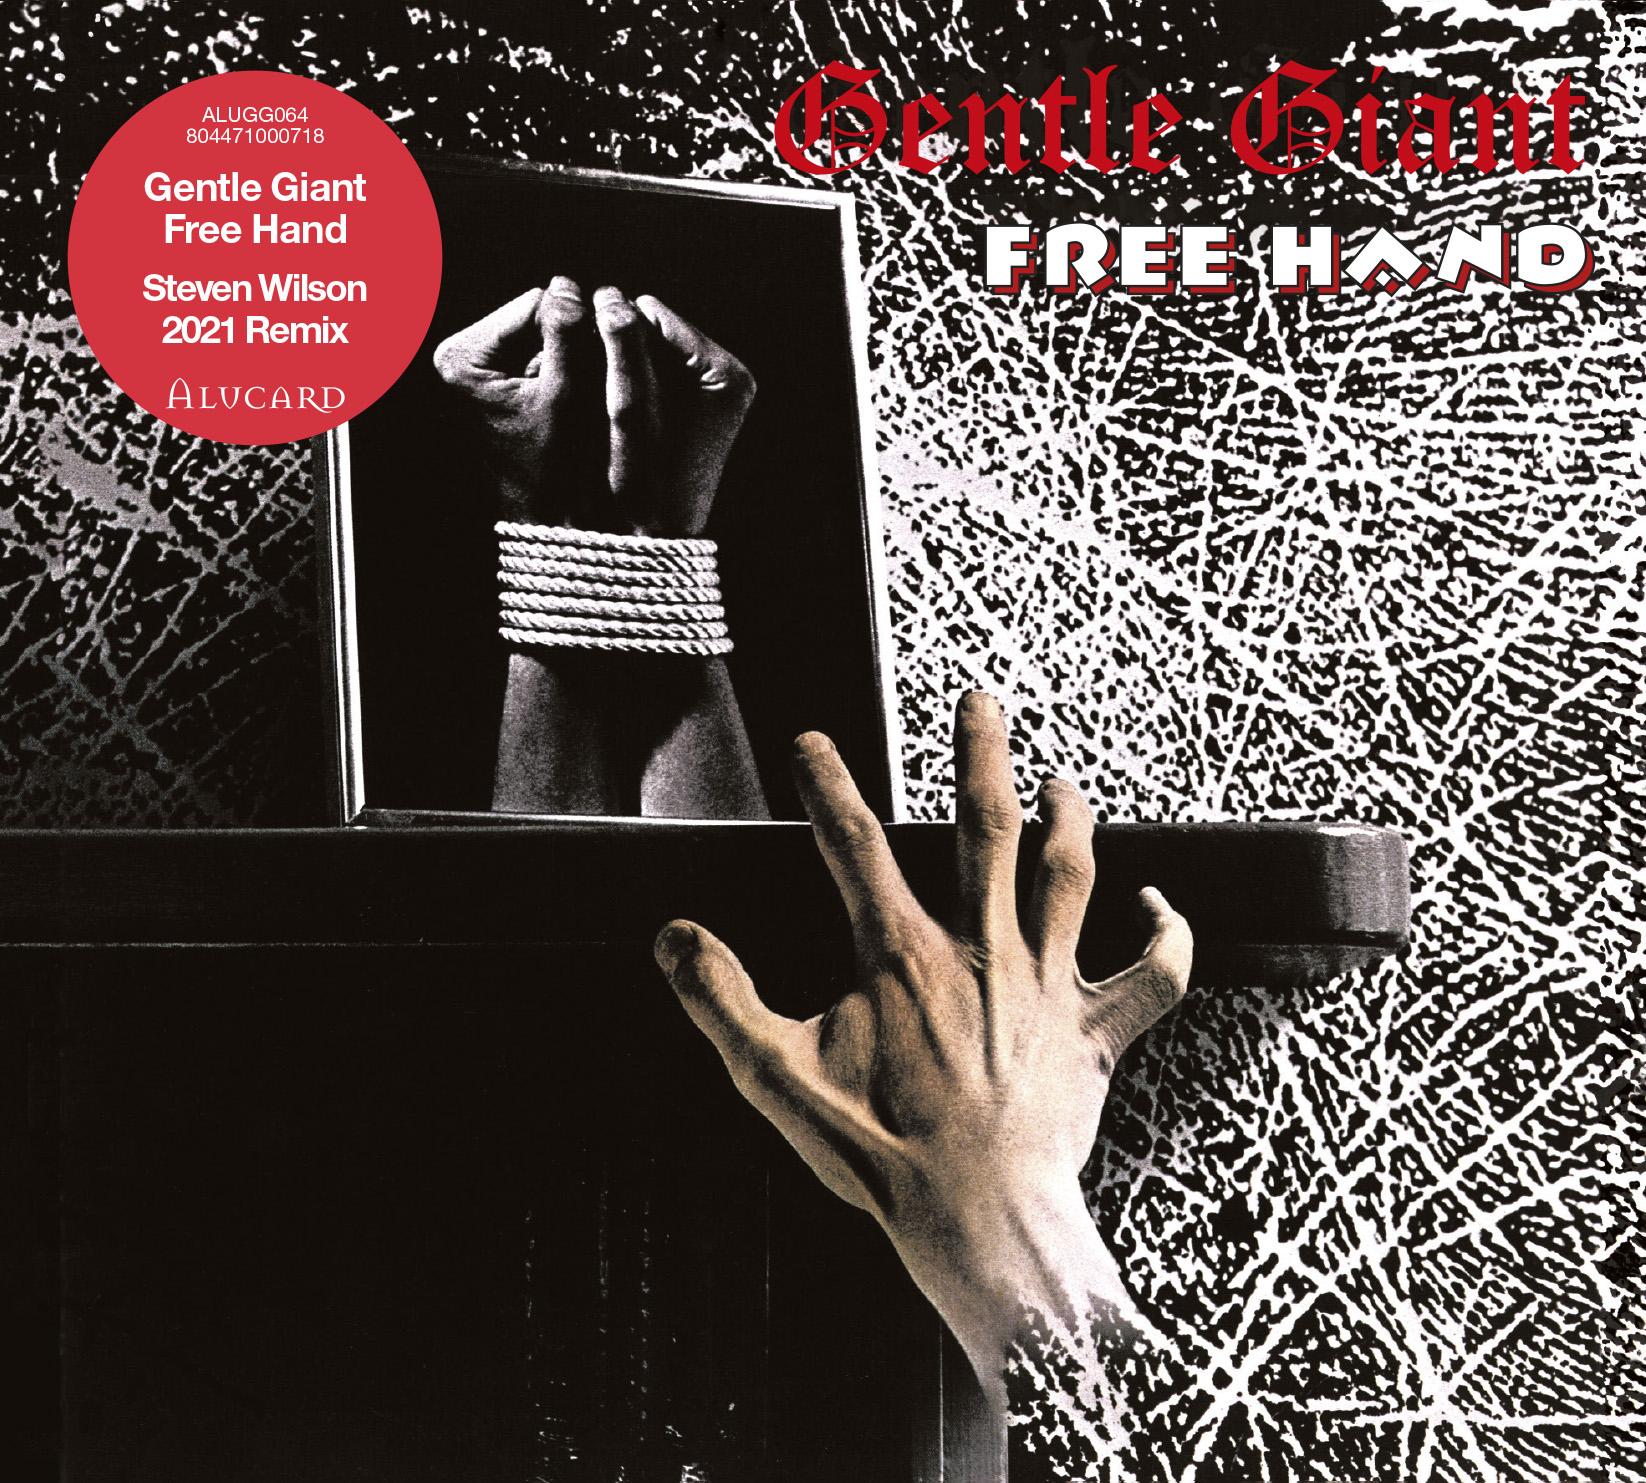 Free Hand (Steven Wilson Remix) Image